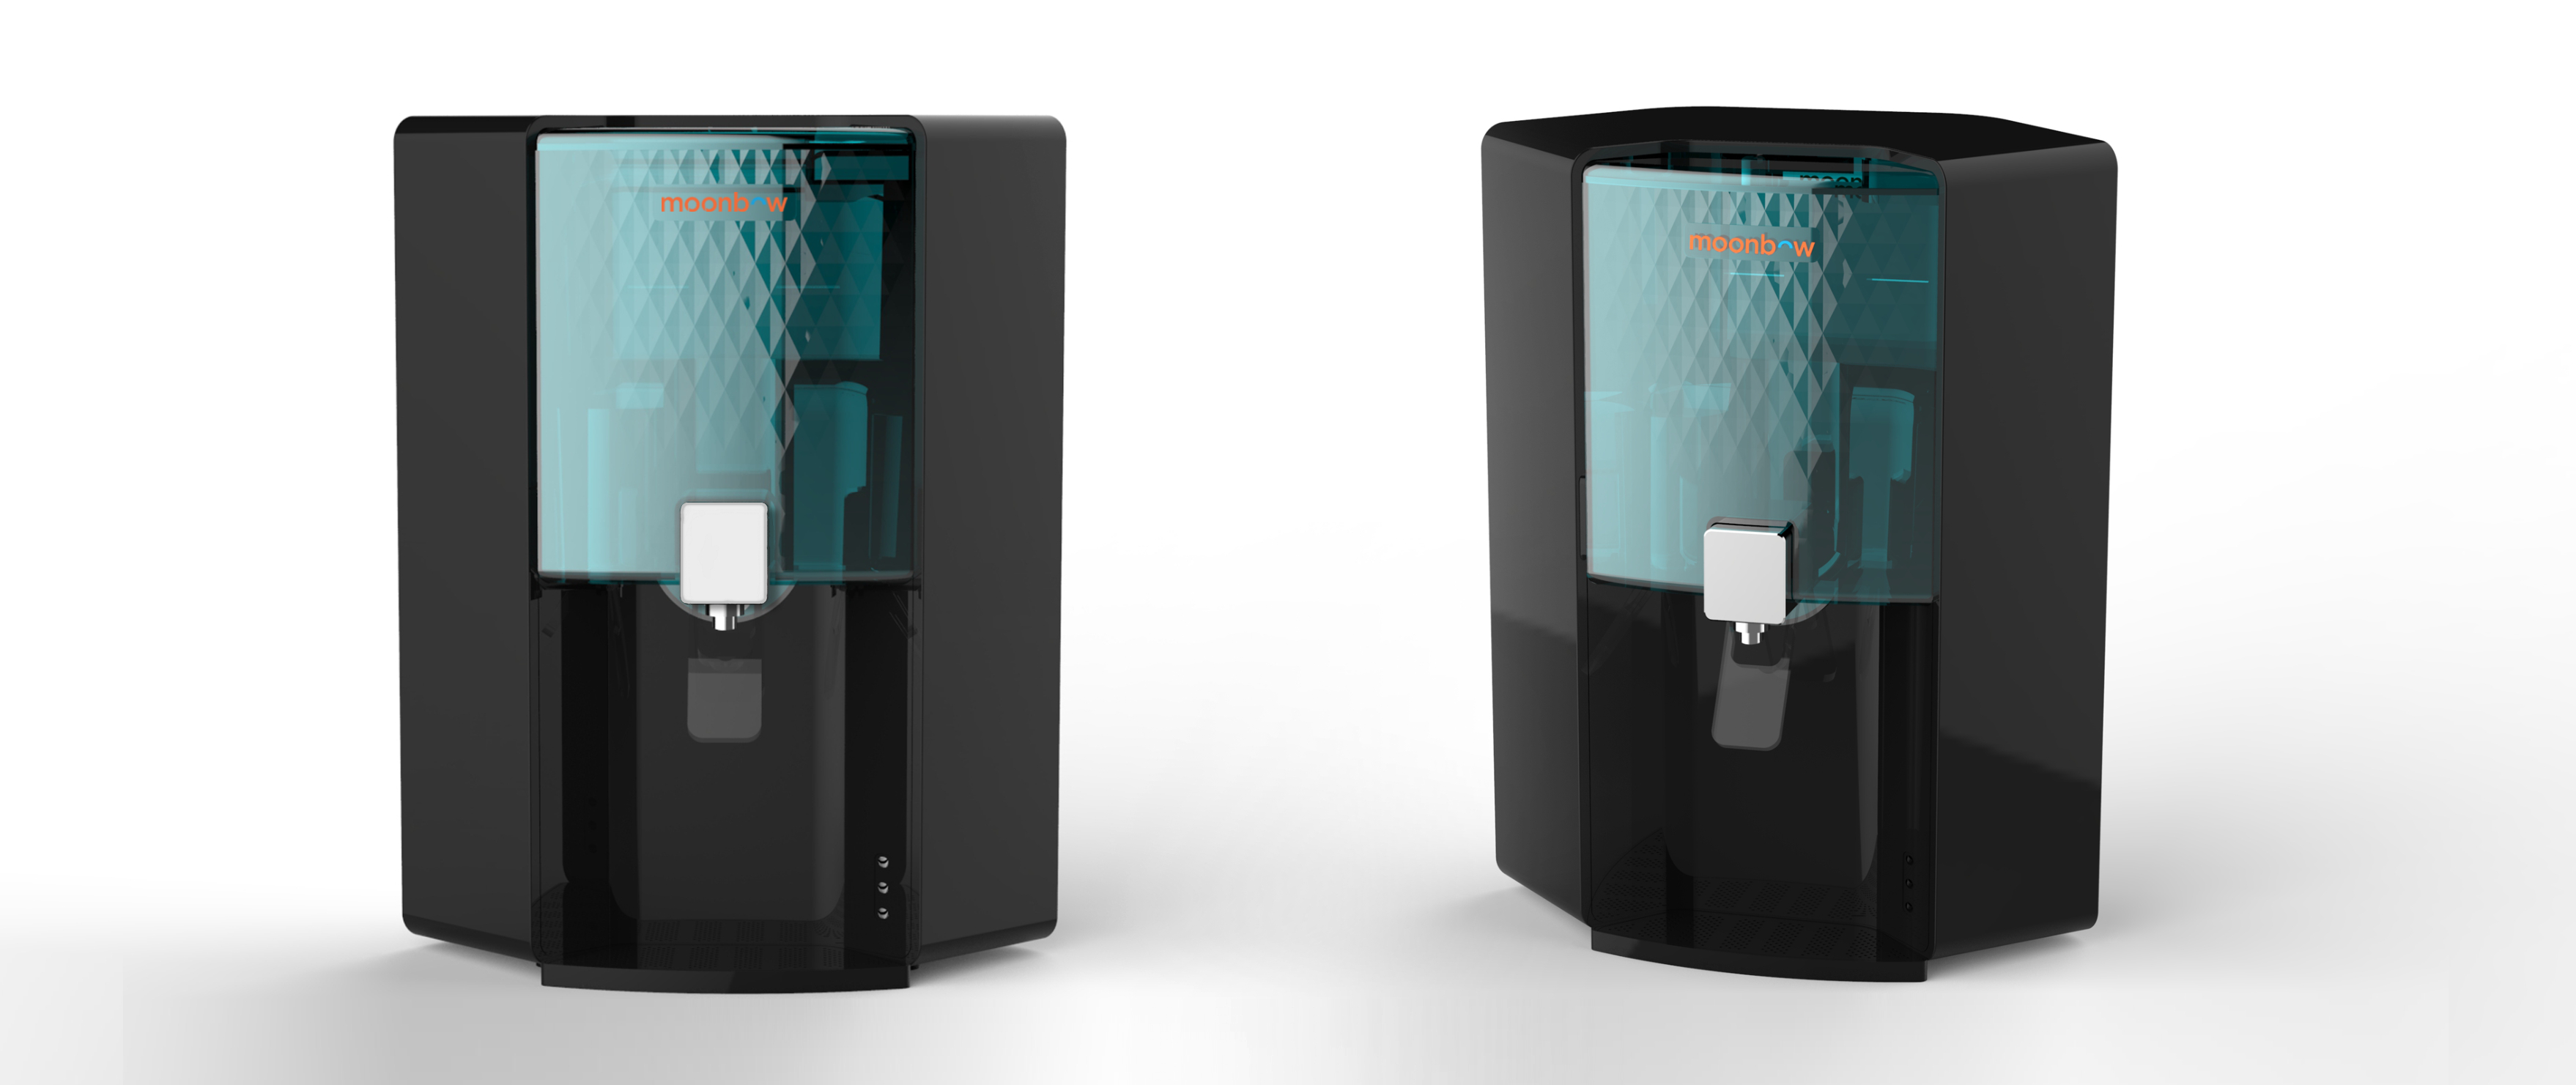 Moonbow Water Purifier Design